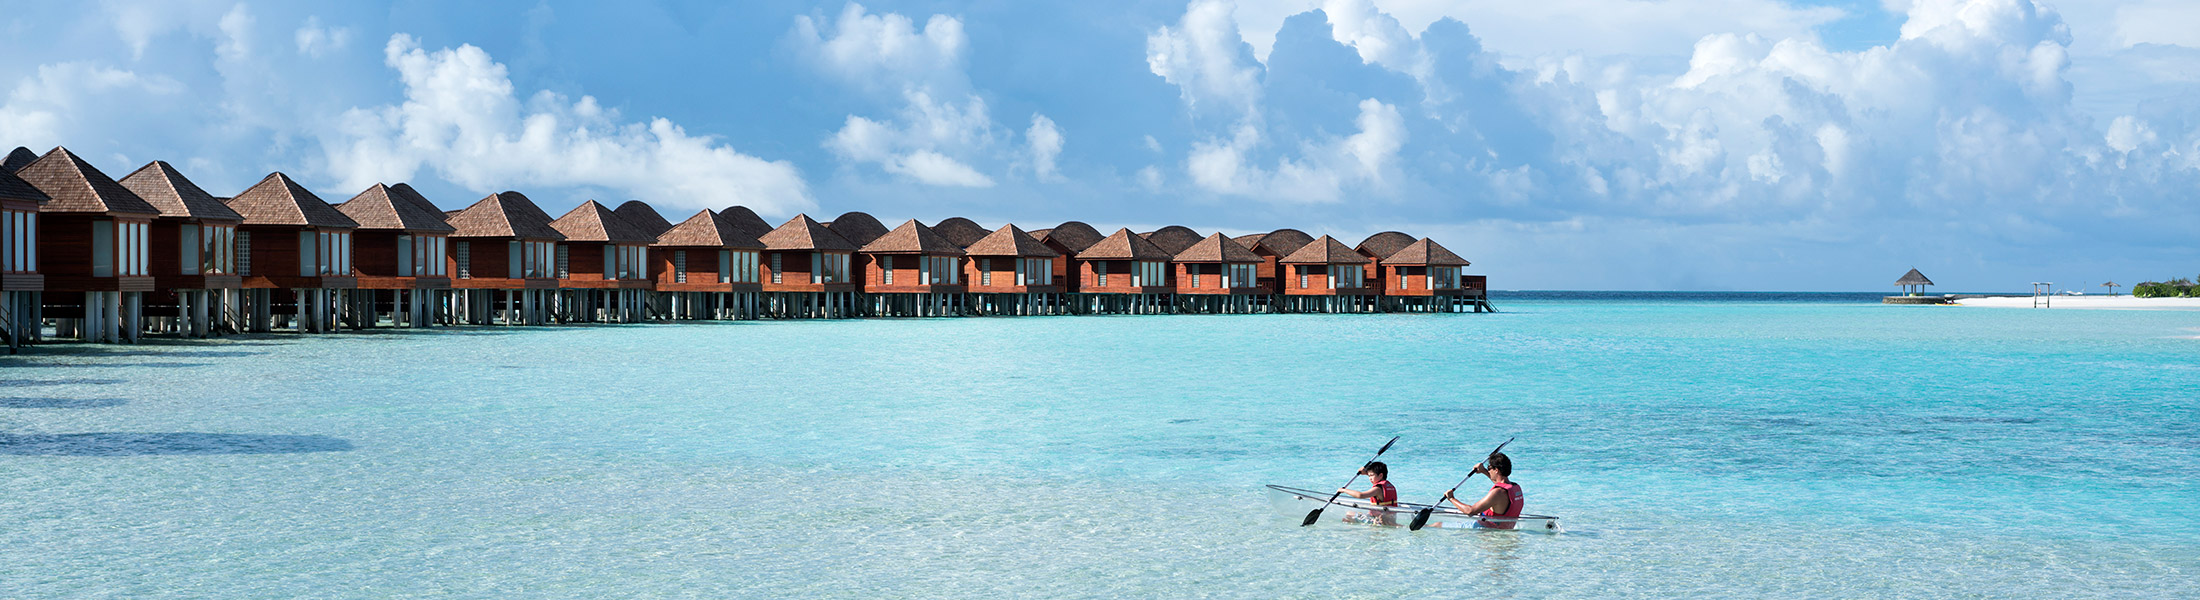 Couple kayaking in front of over water villas at Anantara Dhigu Resort